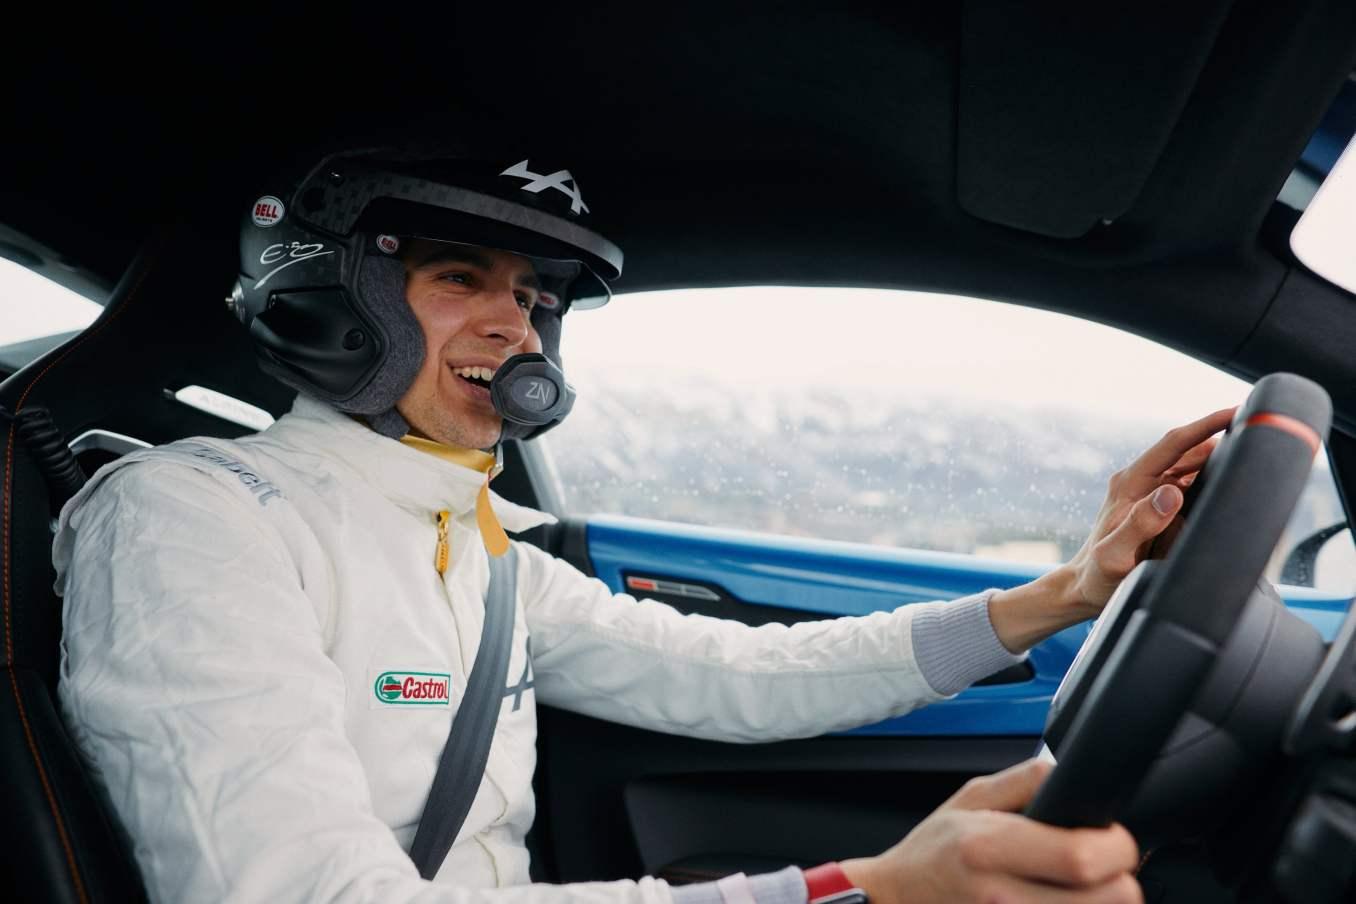 Esteban Ocon Rallye Monte Carlo 2021 Alpine A110 F1 Team 4   Esteban Ocon s'essaye à l'Alpine A110S au Rallye Monte-Carlo